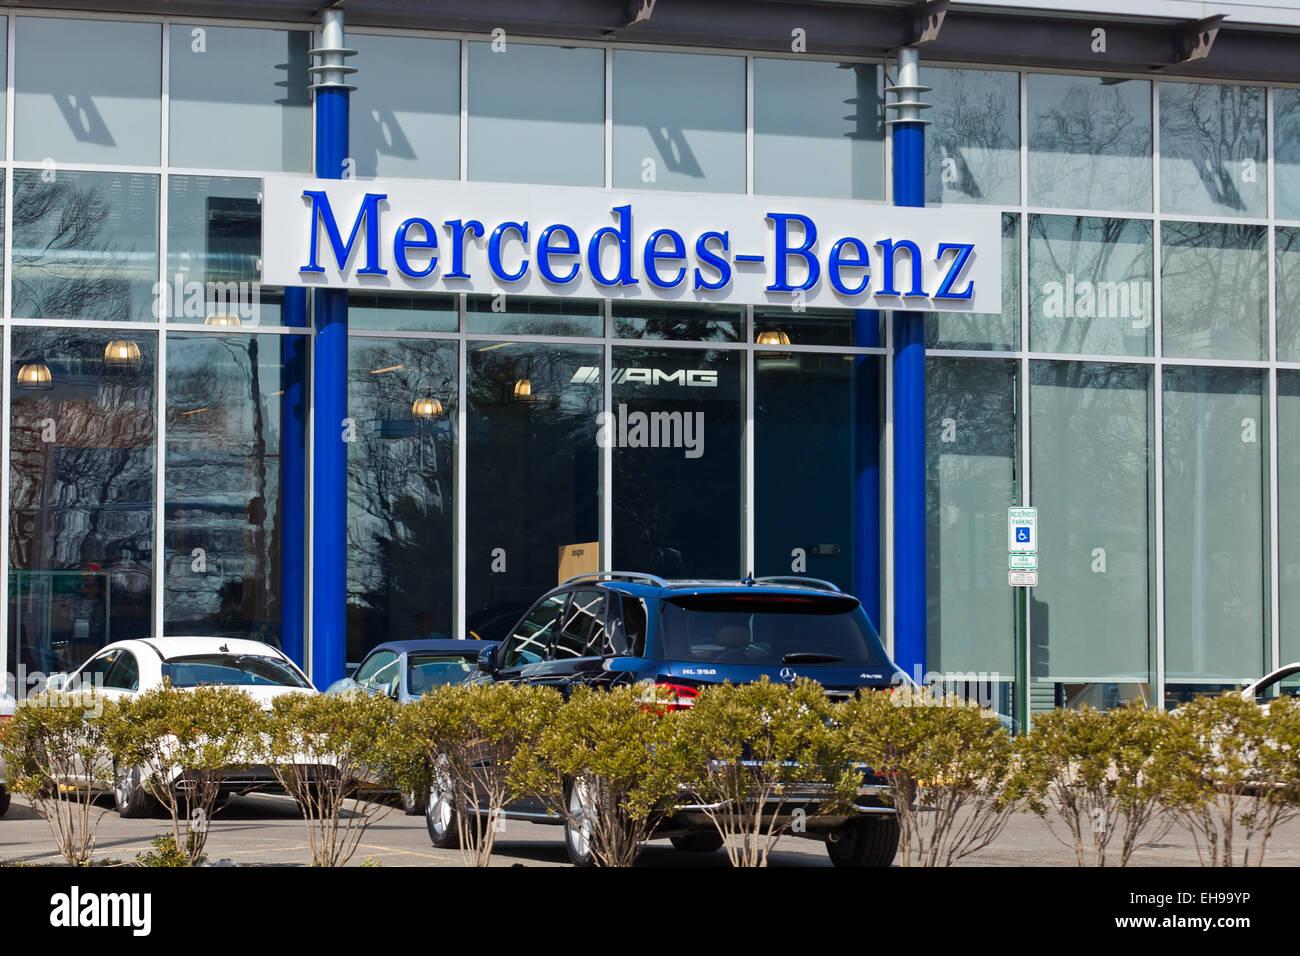 Mercedes-Benz car dealership entrance - USA - Stock Image